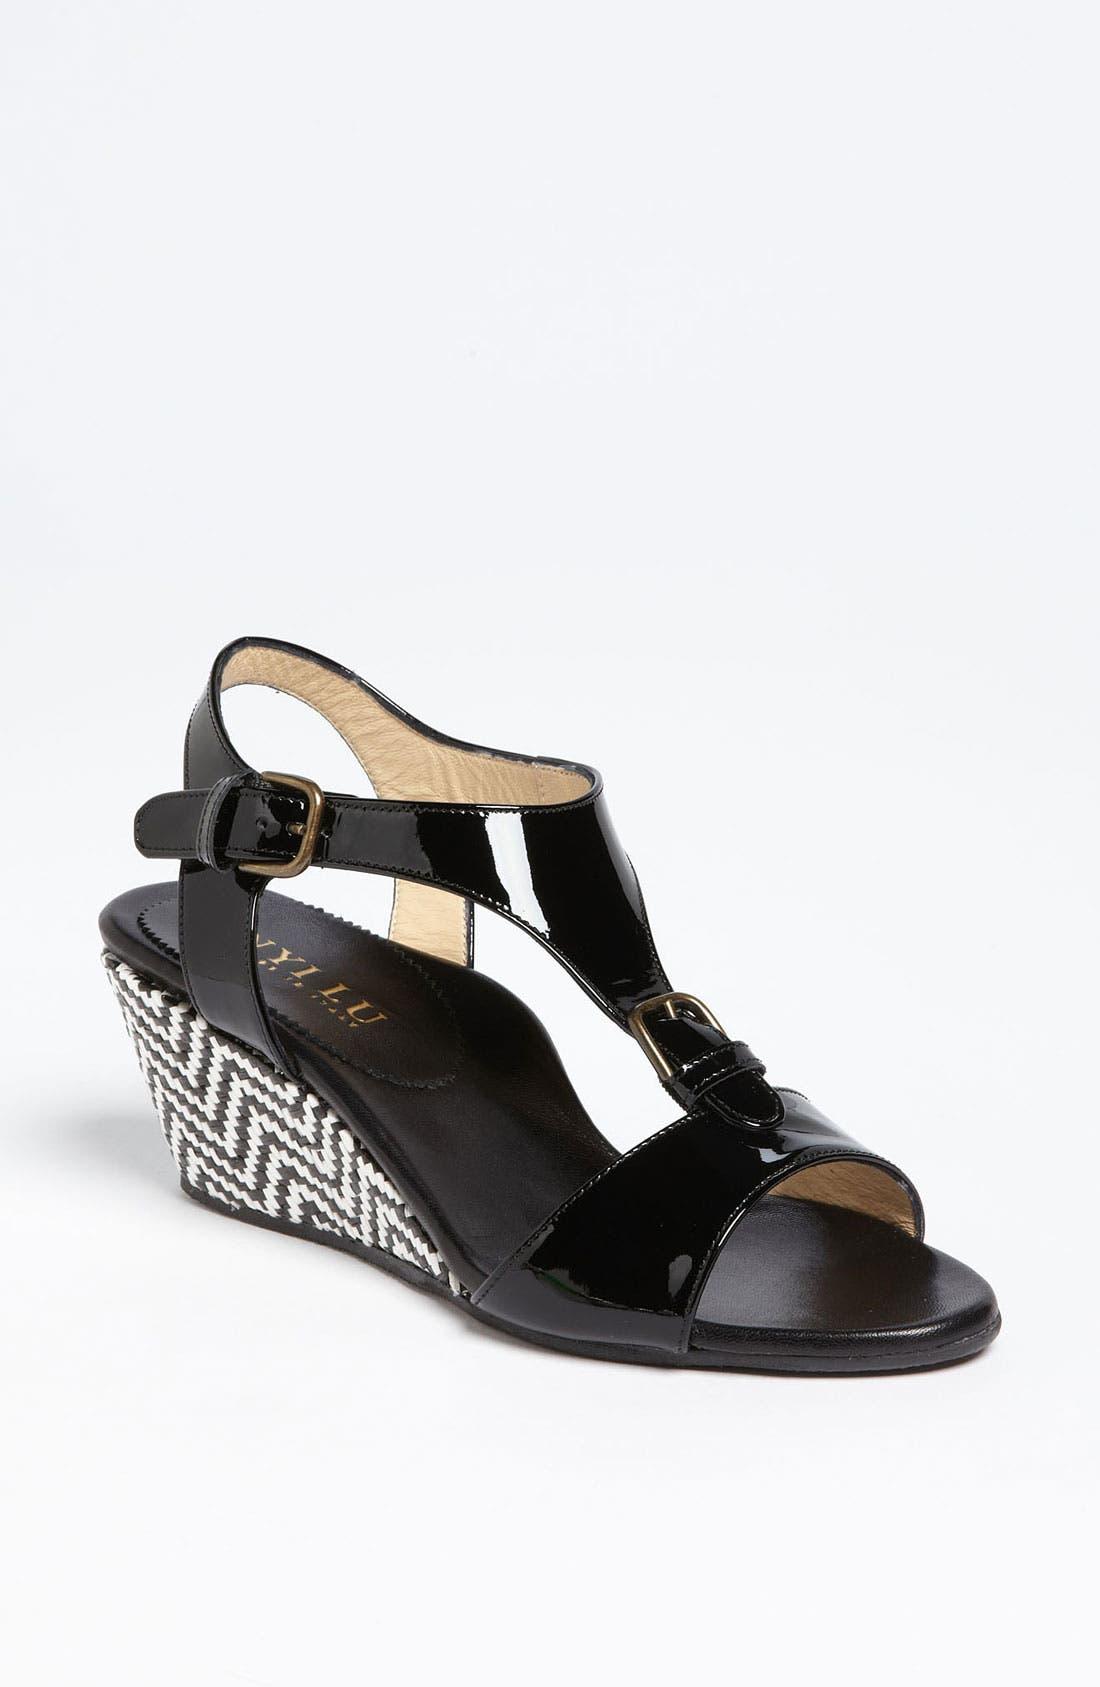 Main Image - Anyi Lu 'Lola' Sandal